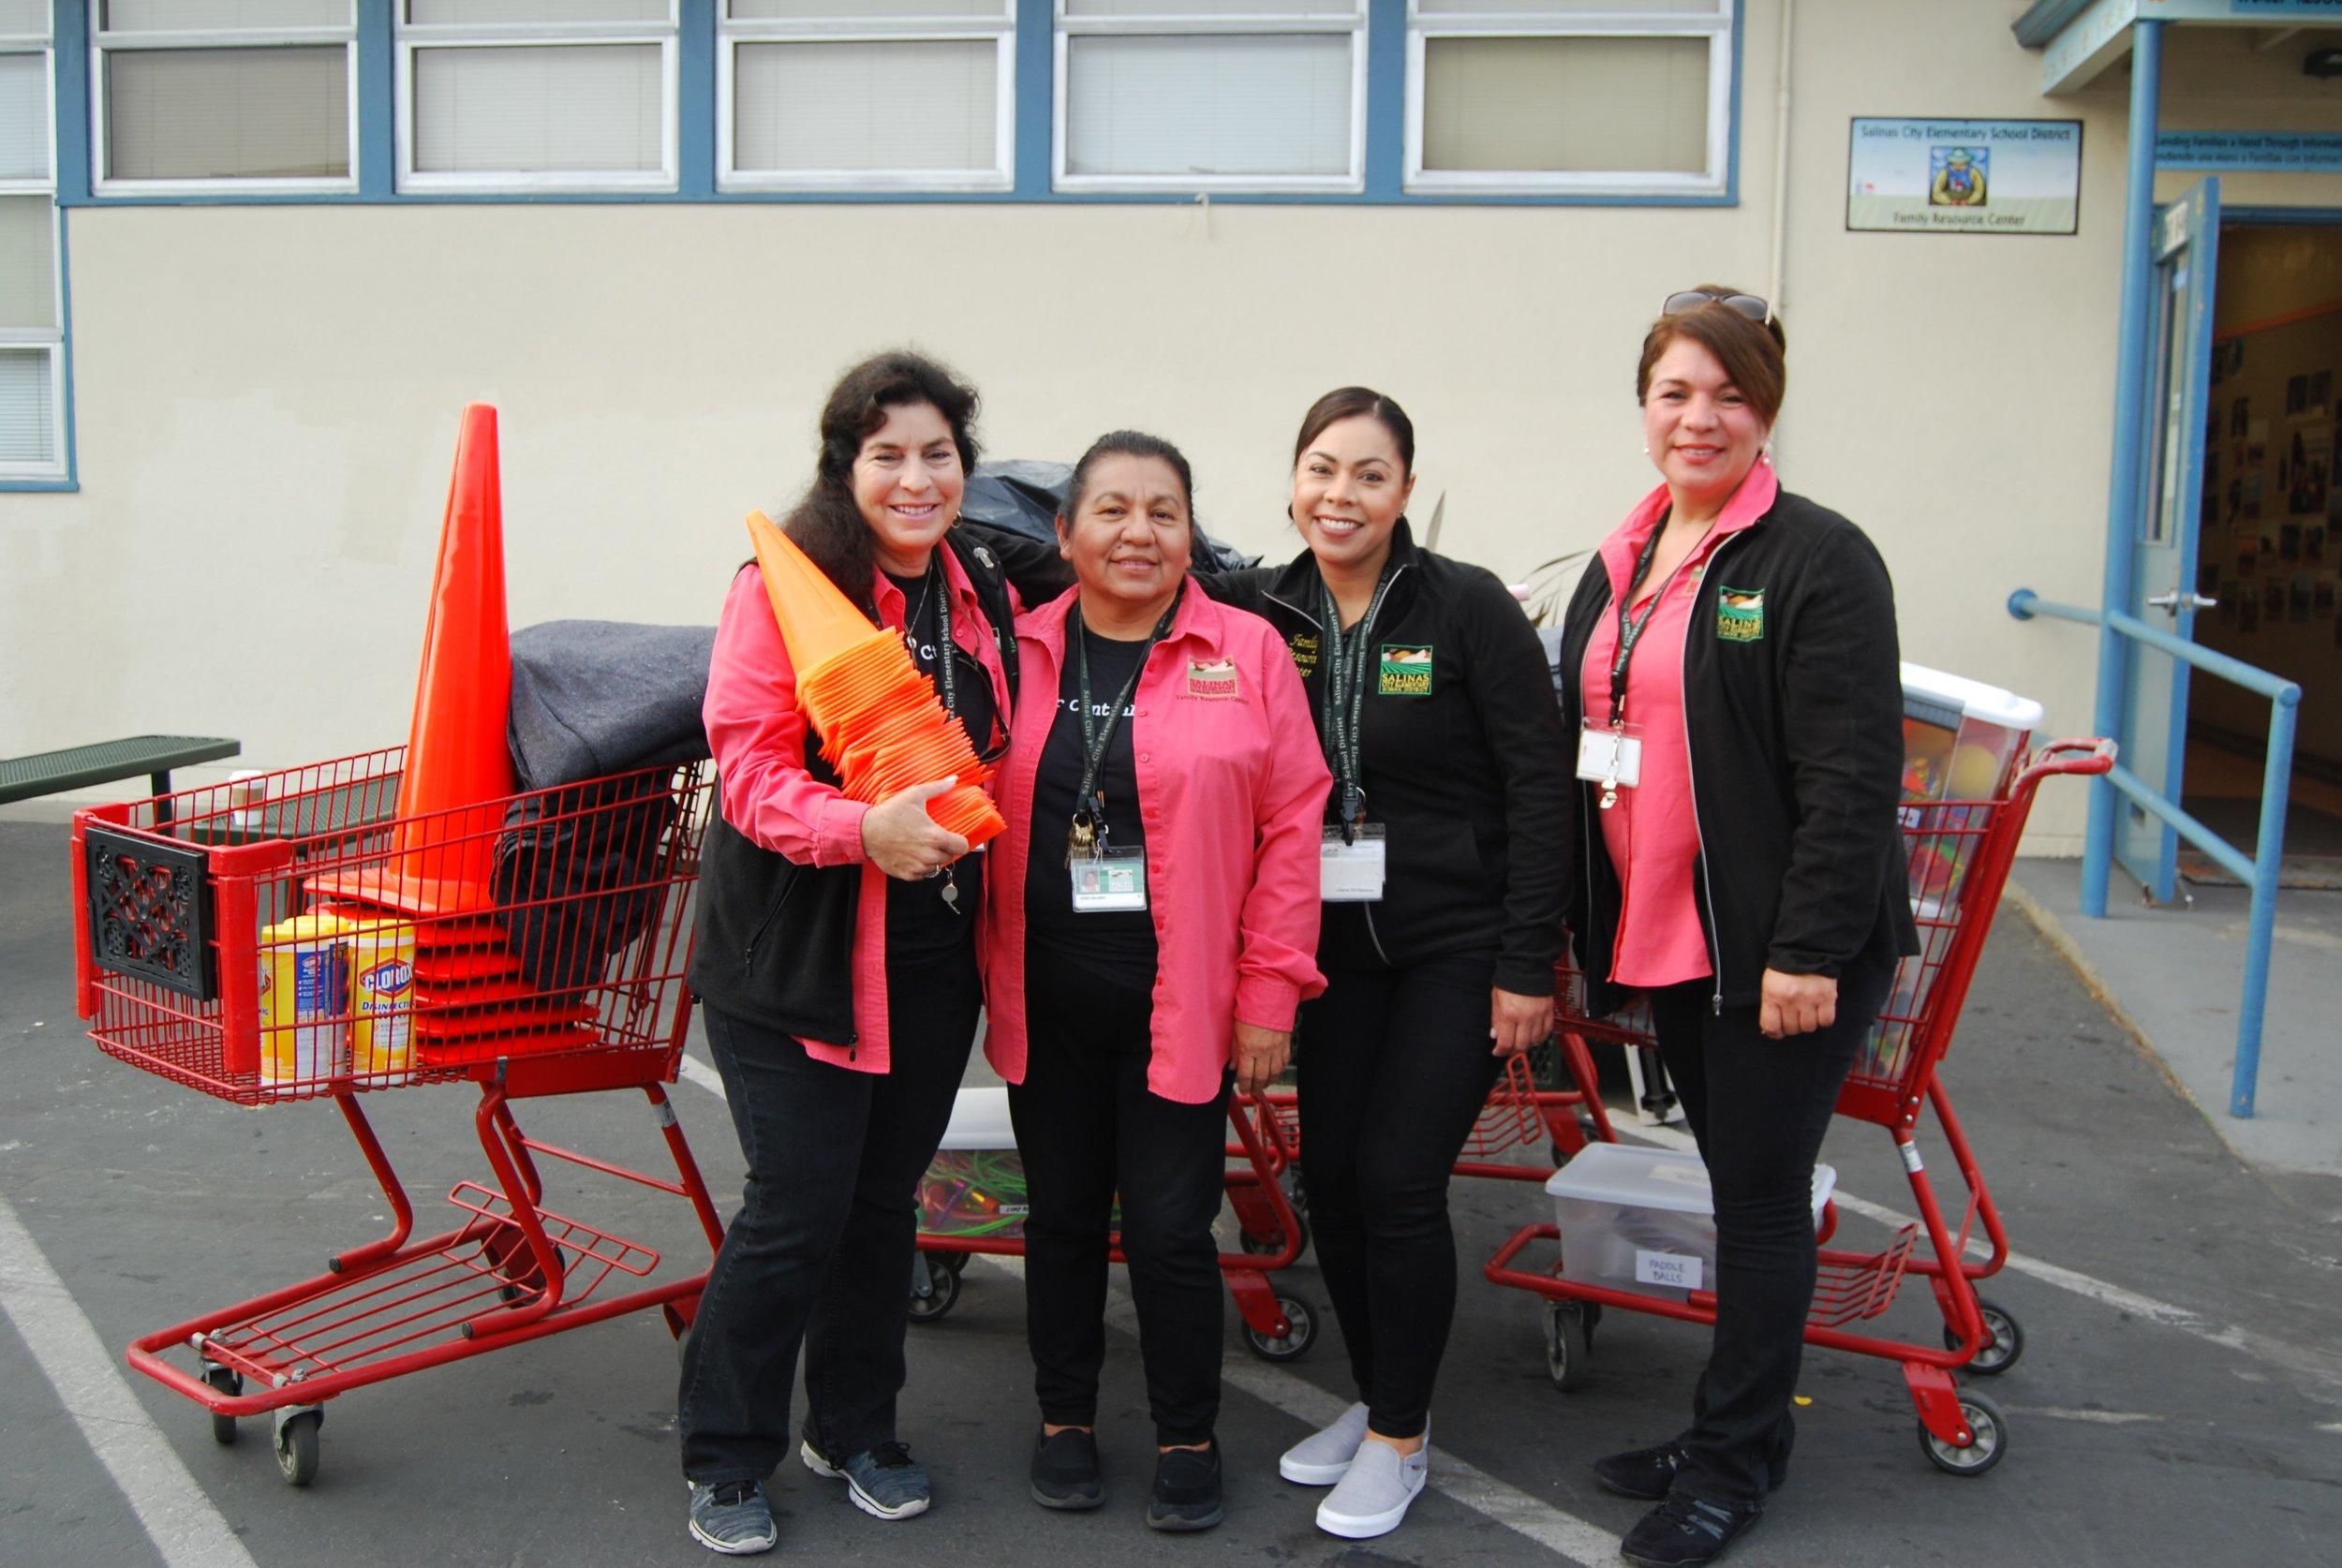 Above Image:   From left to right:  Homeless Liaison Cheryl Camany, Community Coordinator Rosa Salinas and Typist Clerks Liliana Gil-Ramirez and Diana Morales.